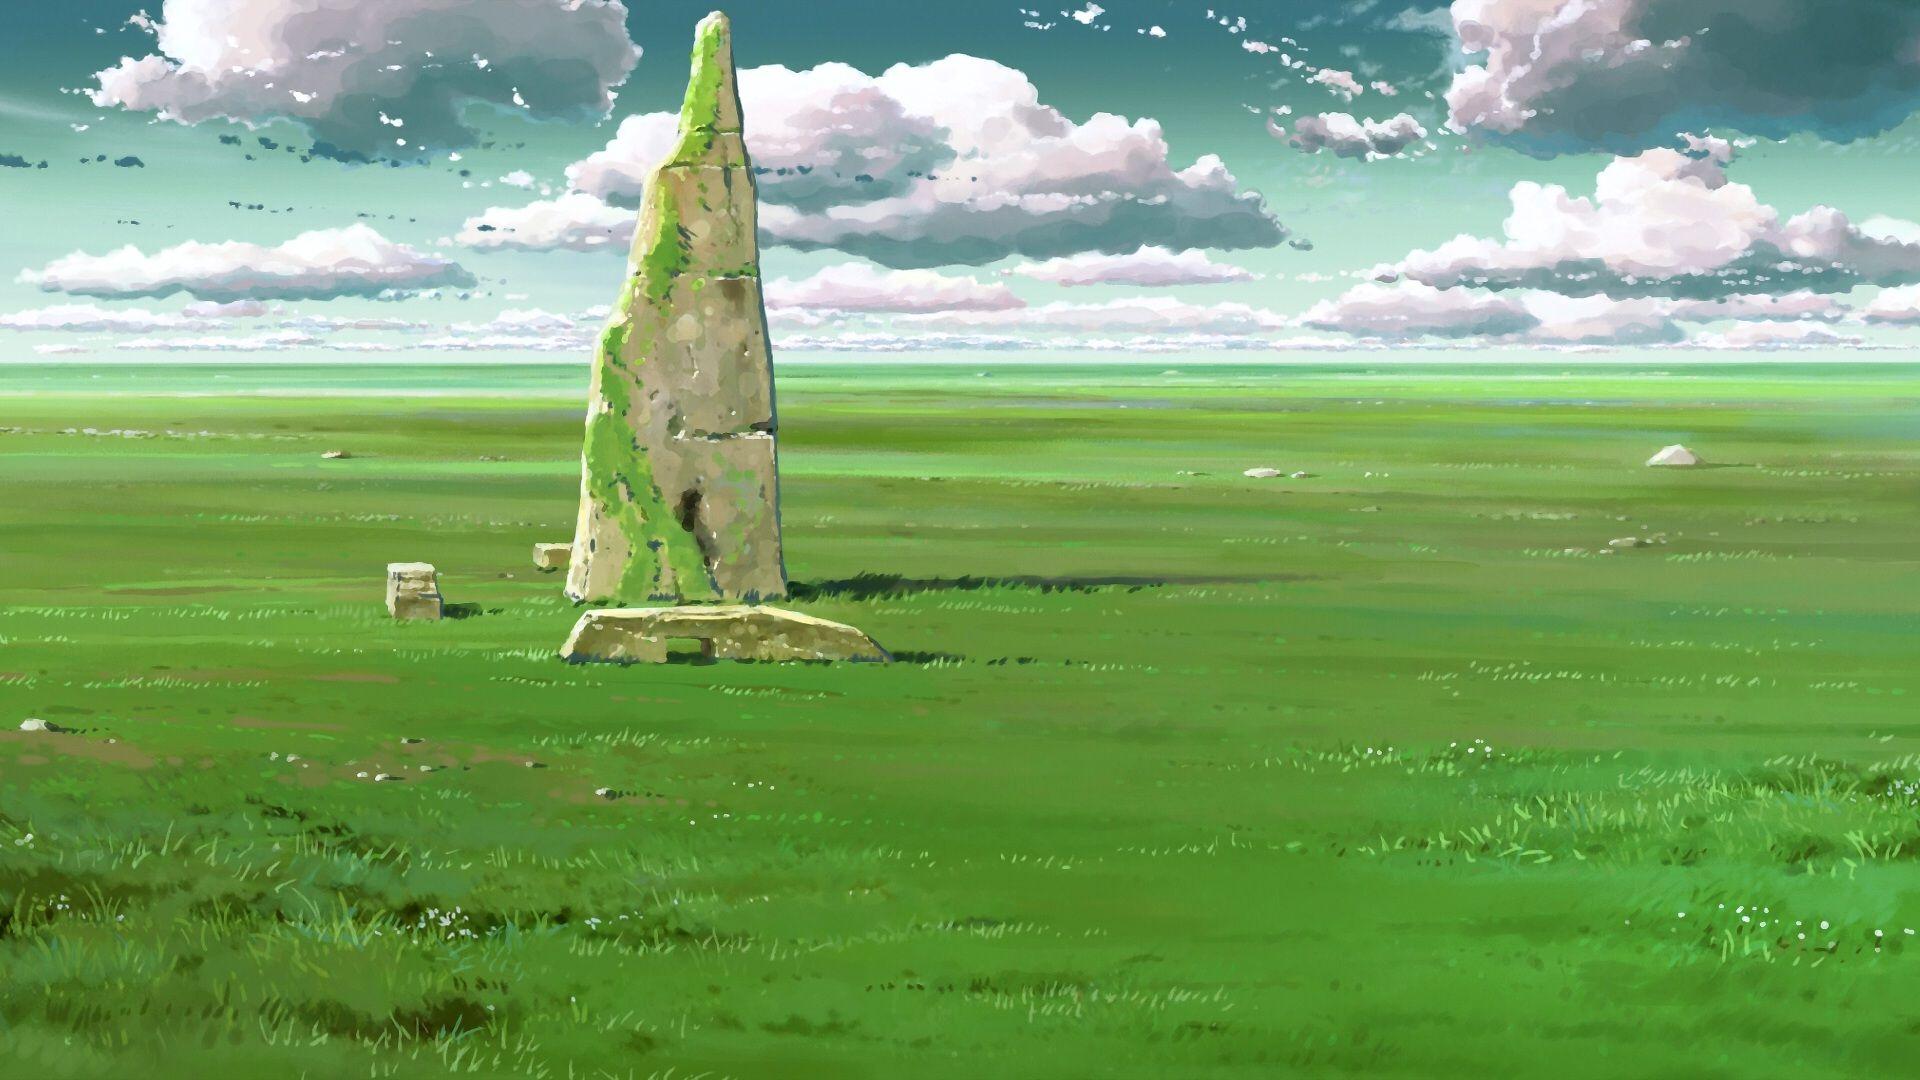 Green Anime Ladscape Hd Wallpaper 1920x1080 Id 56173 Anime Scenery Scenery Wallpaper Anime City